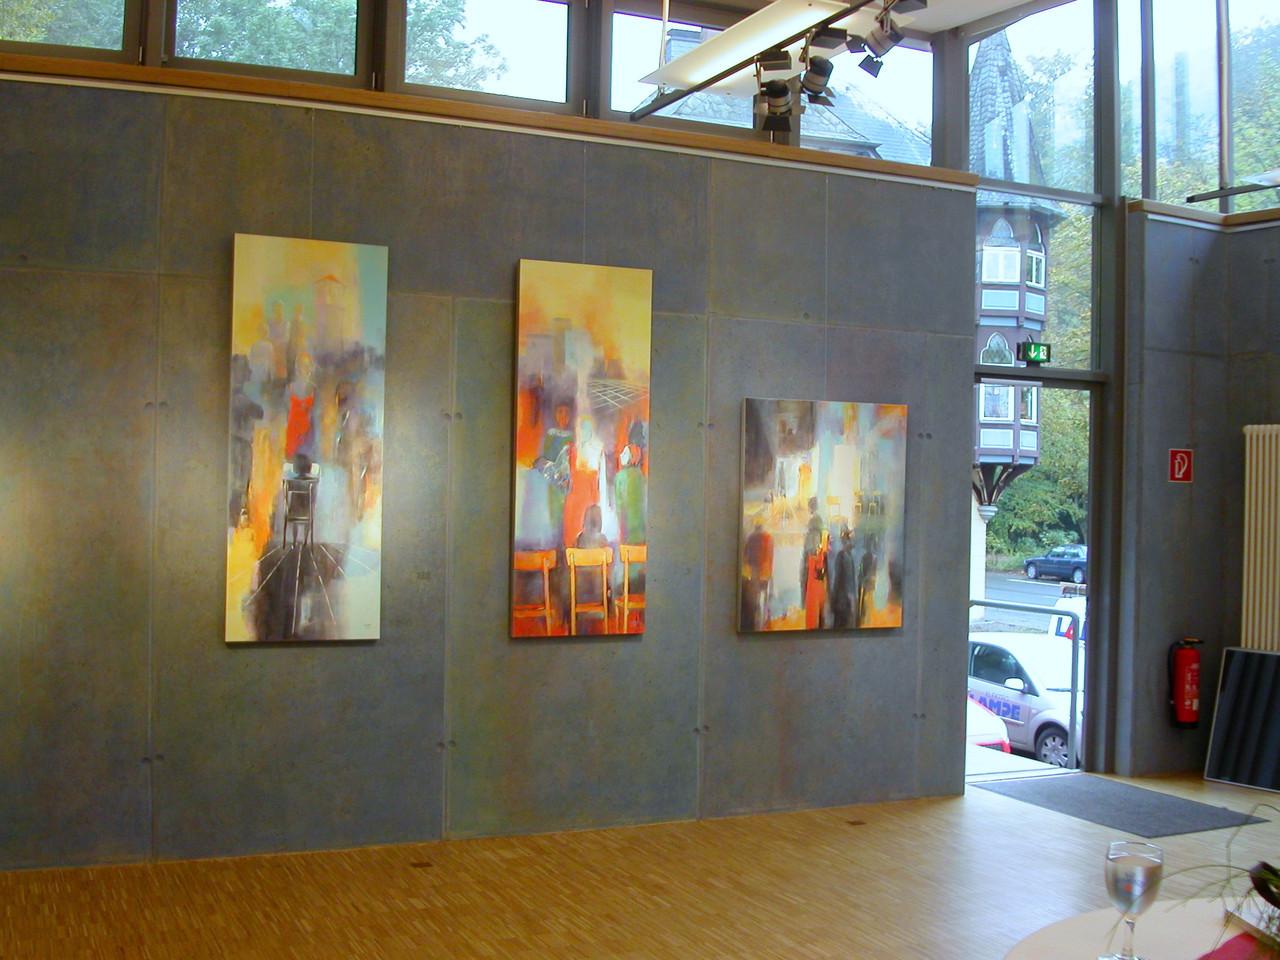 Ausstellung im Sommertheater Detmold, 2009